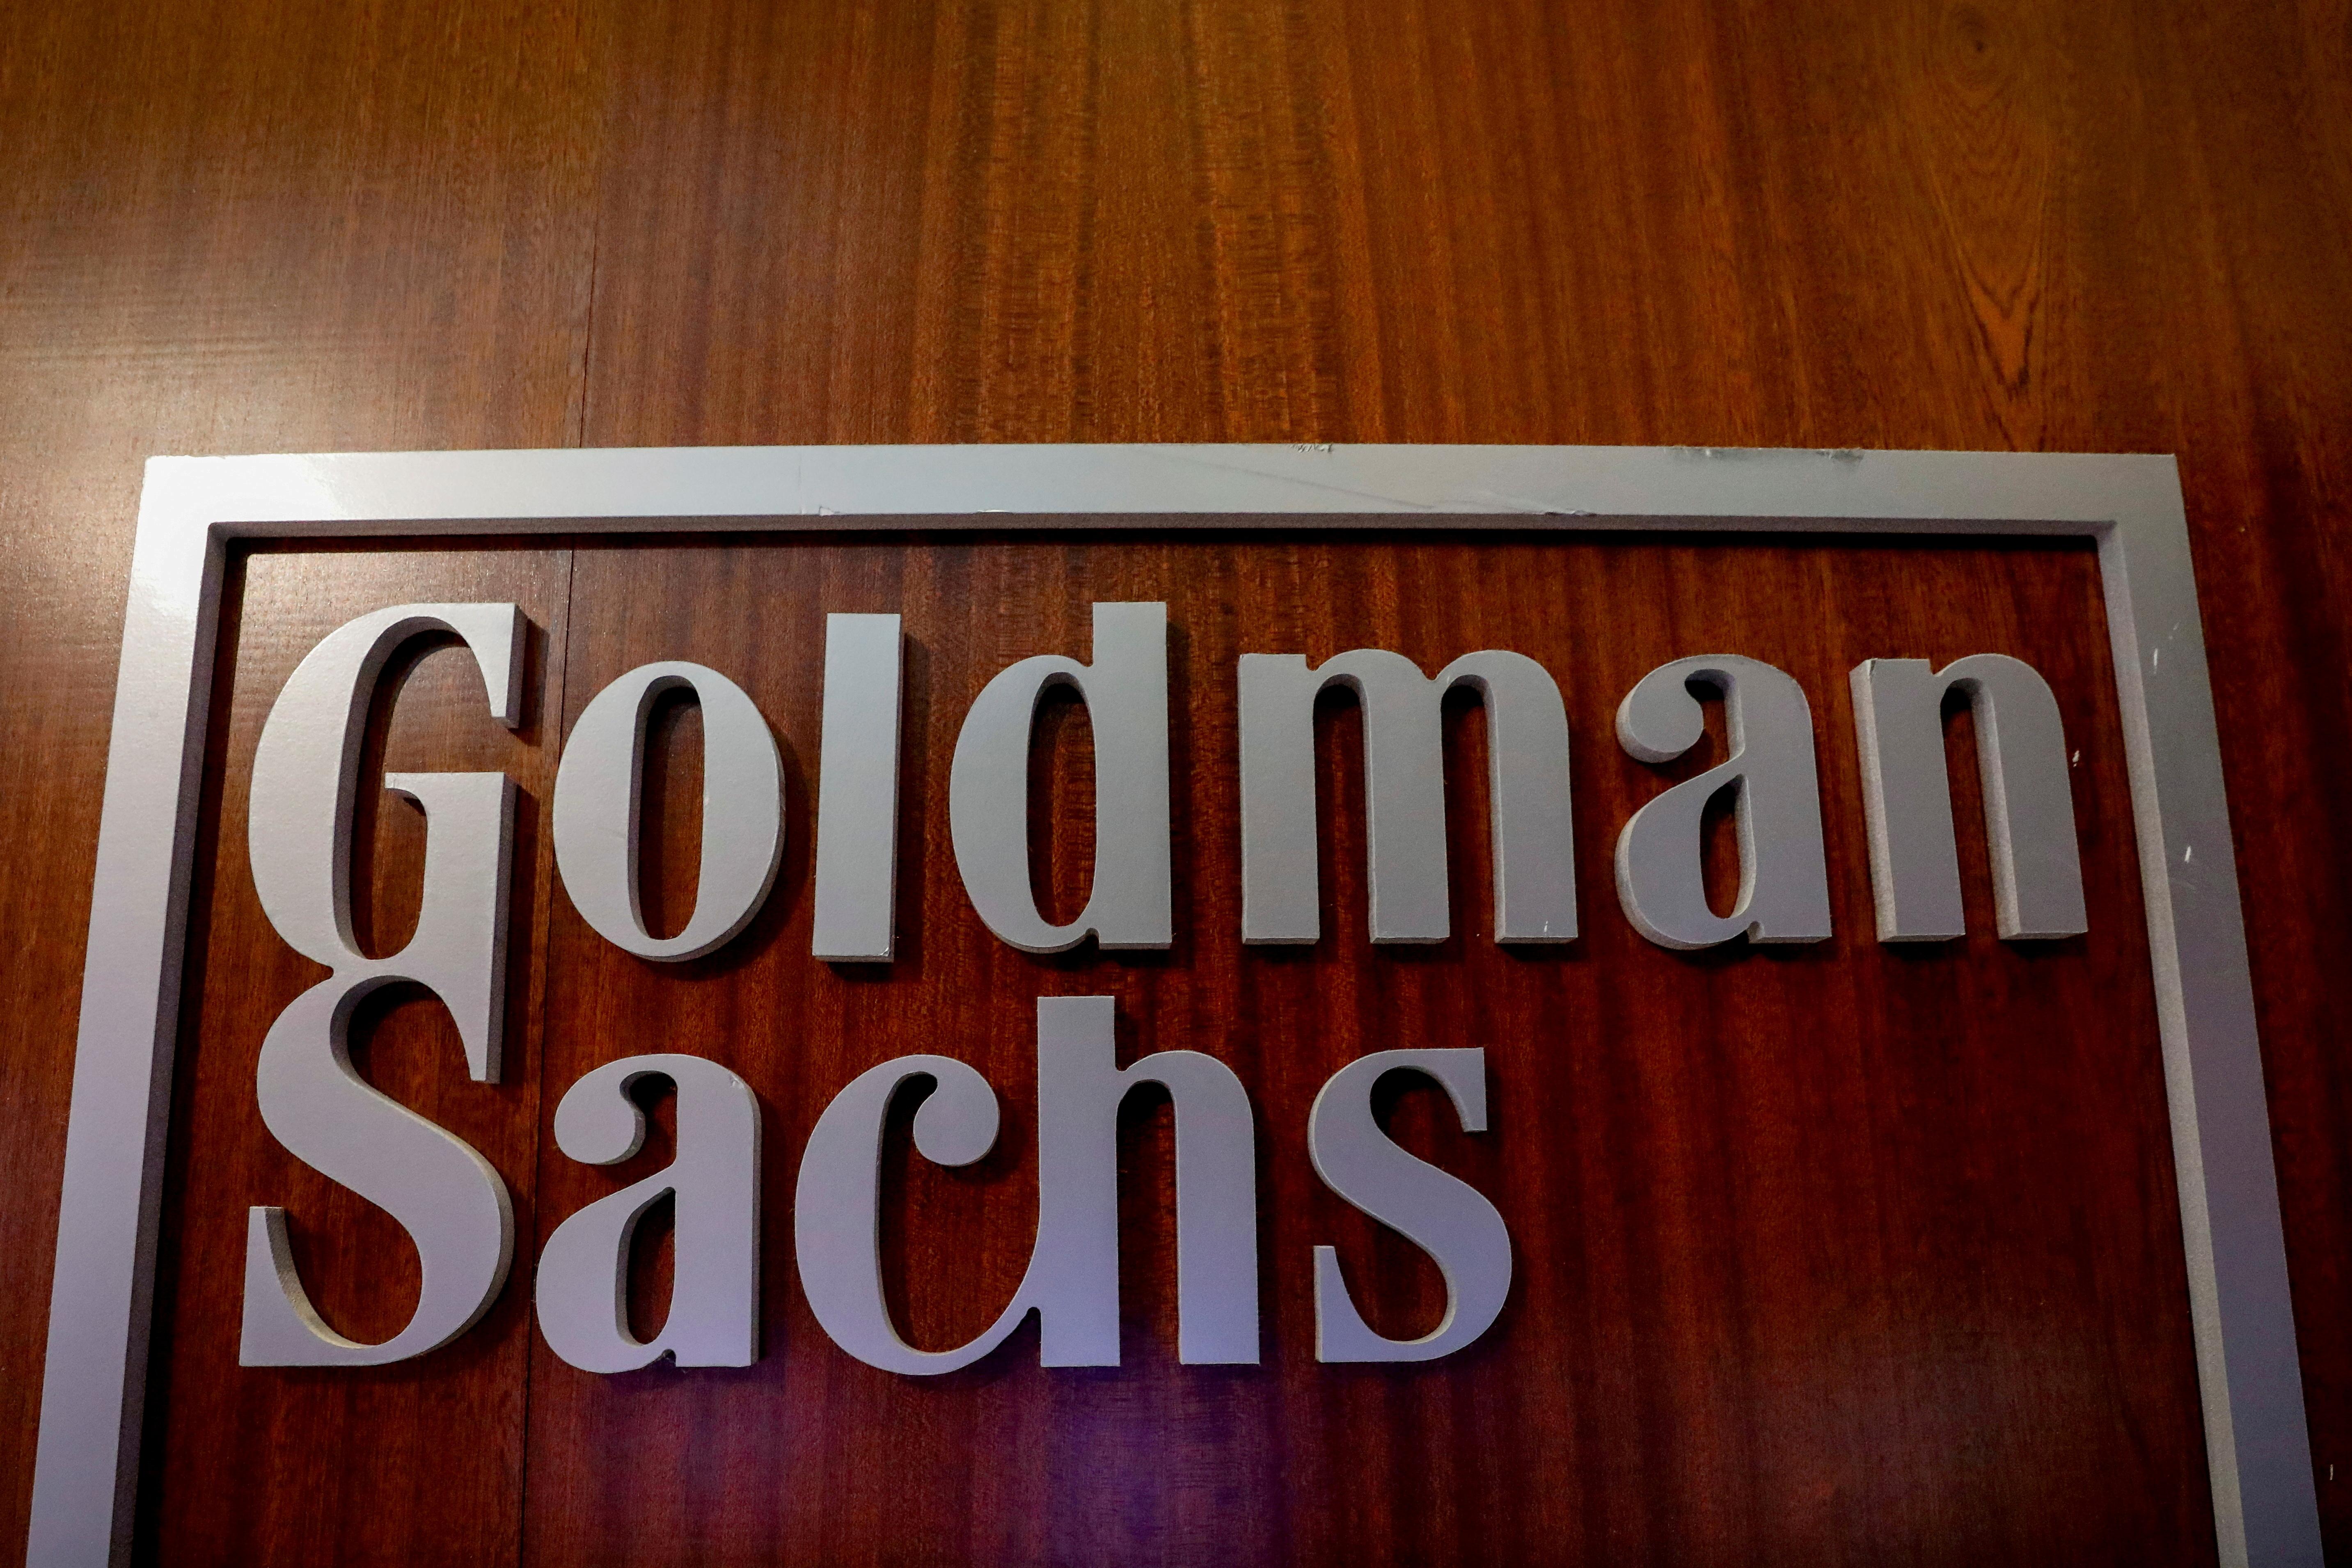 The Goldman Sachs company logo in New York, U.S., April 17, 2018. REUTERS/Brendan McDermid//File Photo